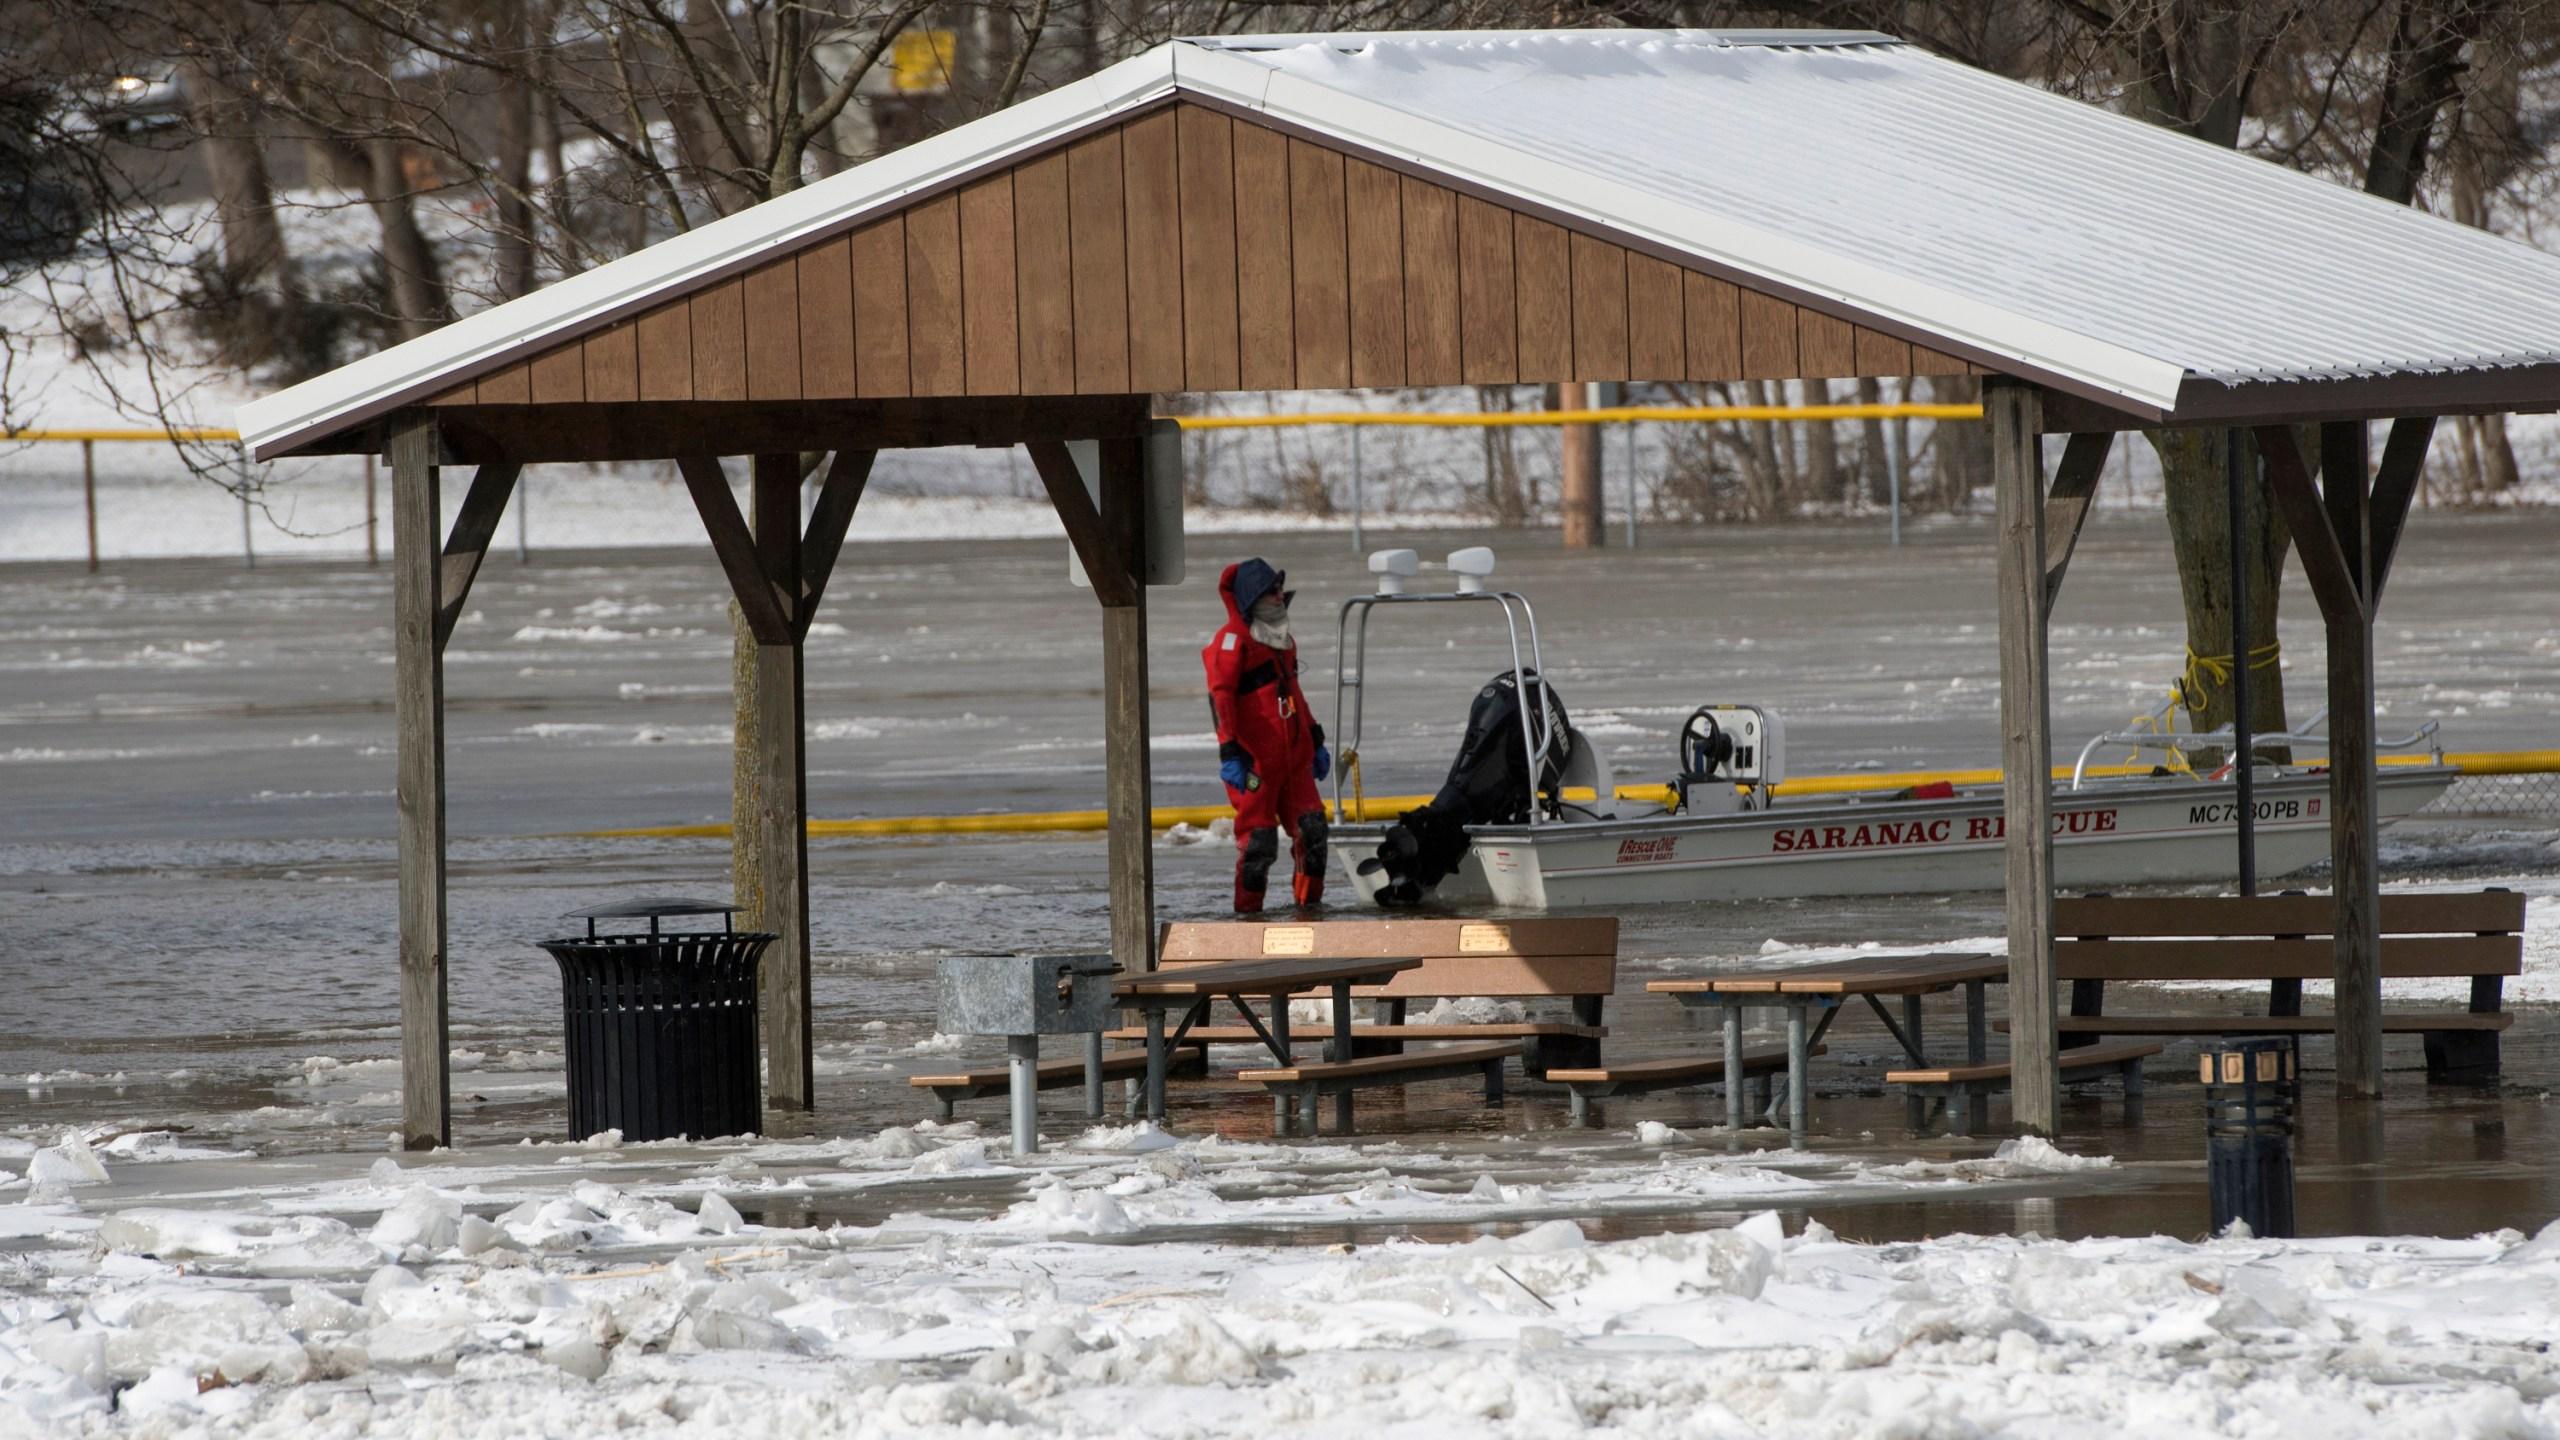 Winter_Weather_Michigan_82072-159532.jpg84237689